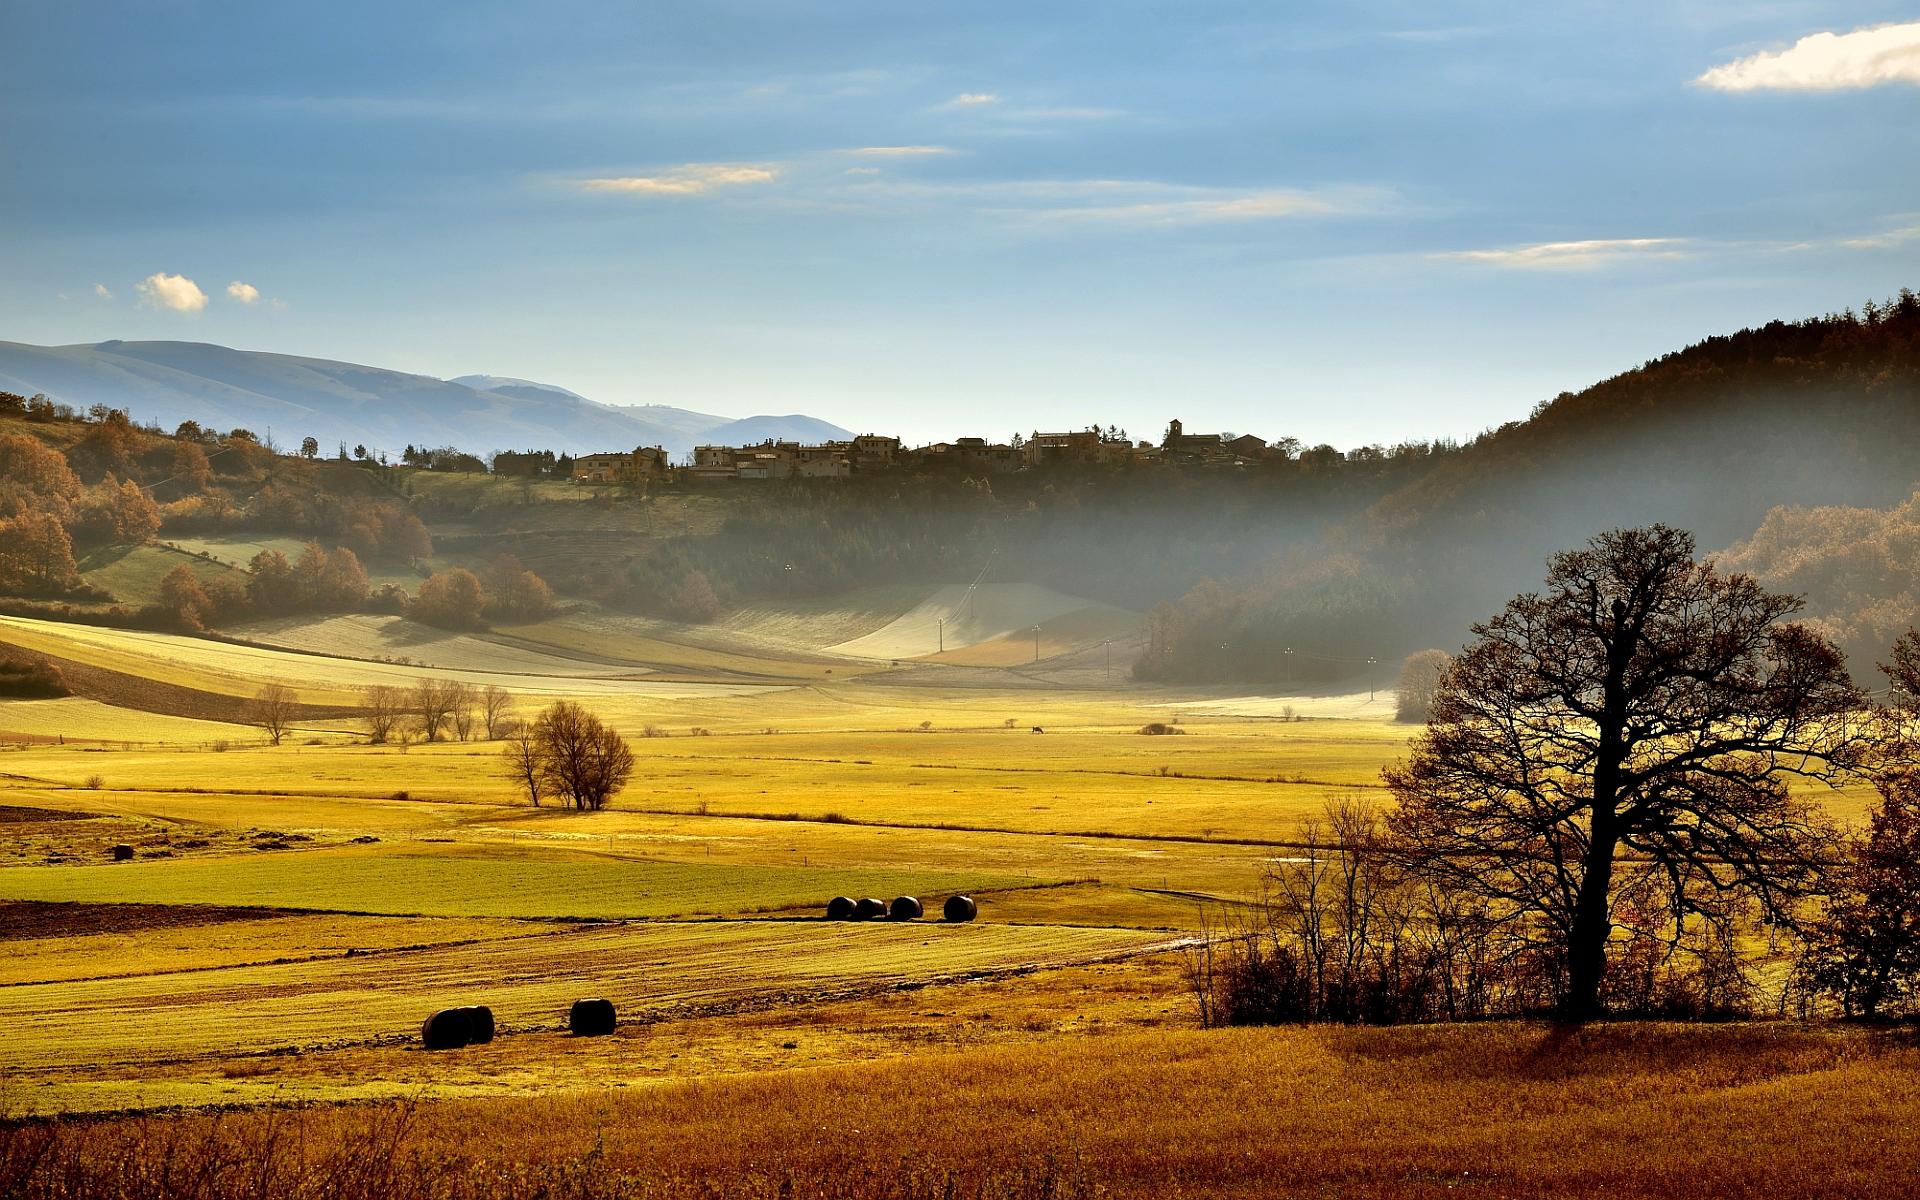 Italy summer landscape